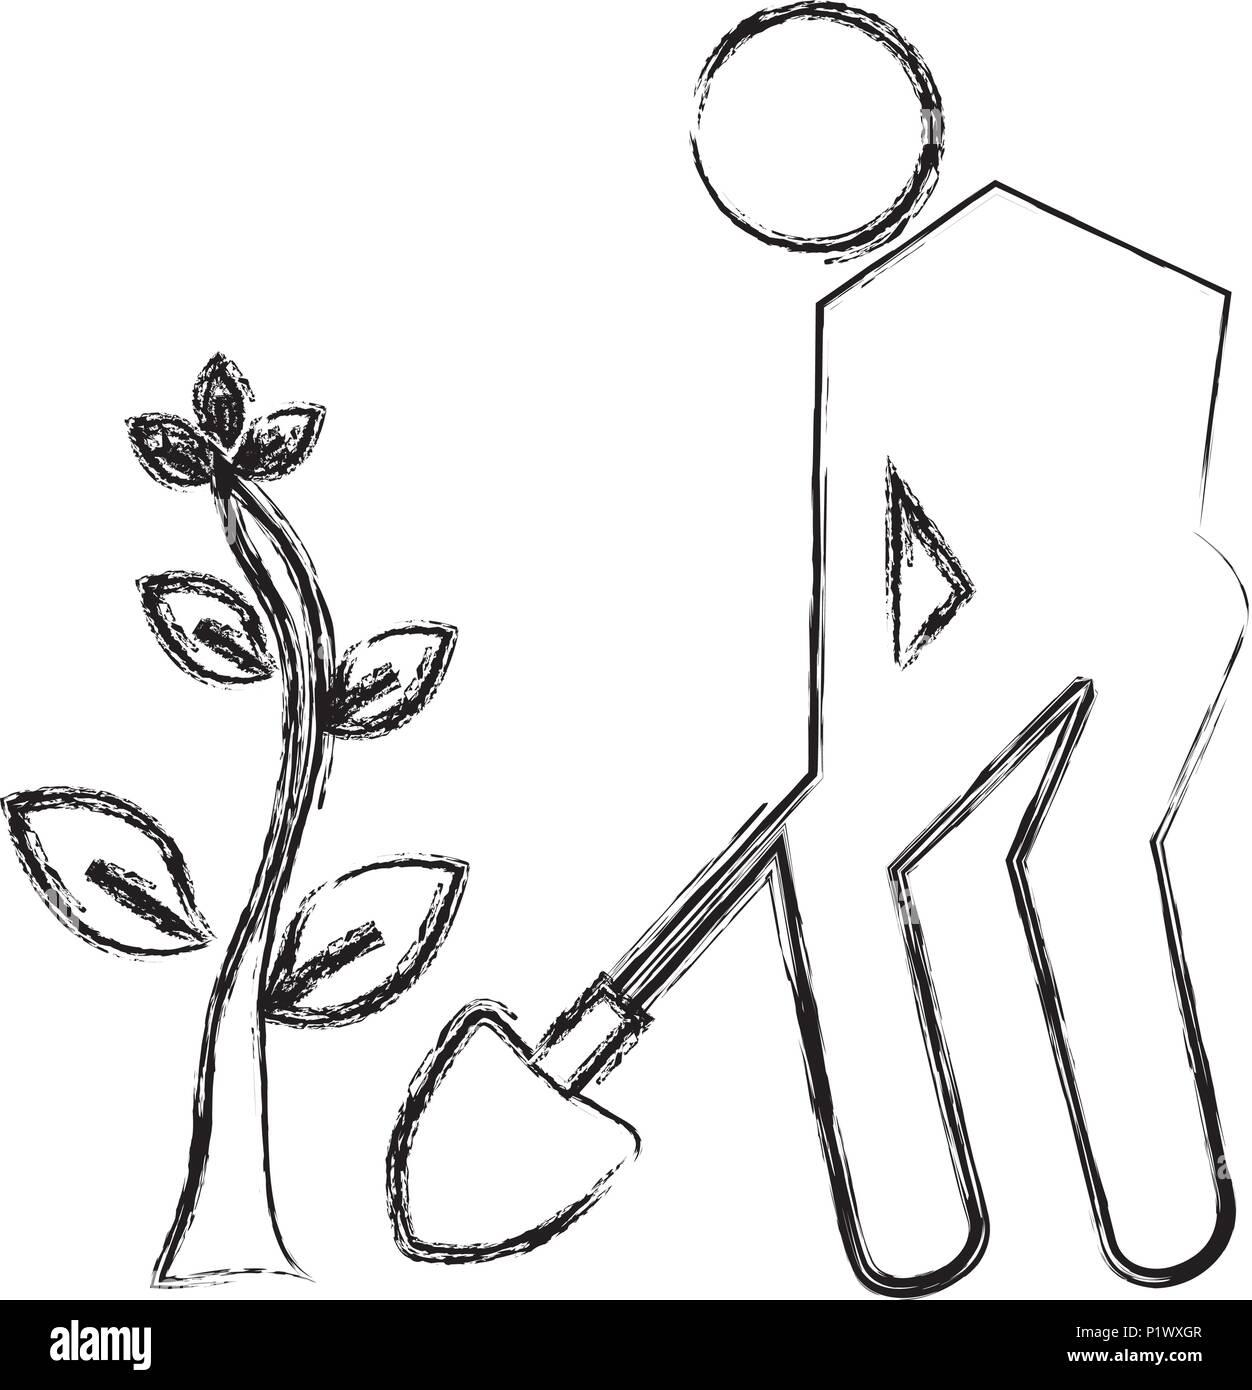 Fabelhaft Silhouette Menschen einen Baum pflanzen Vektor Abbildung - Bild &BB_85